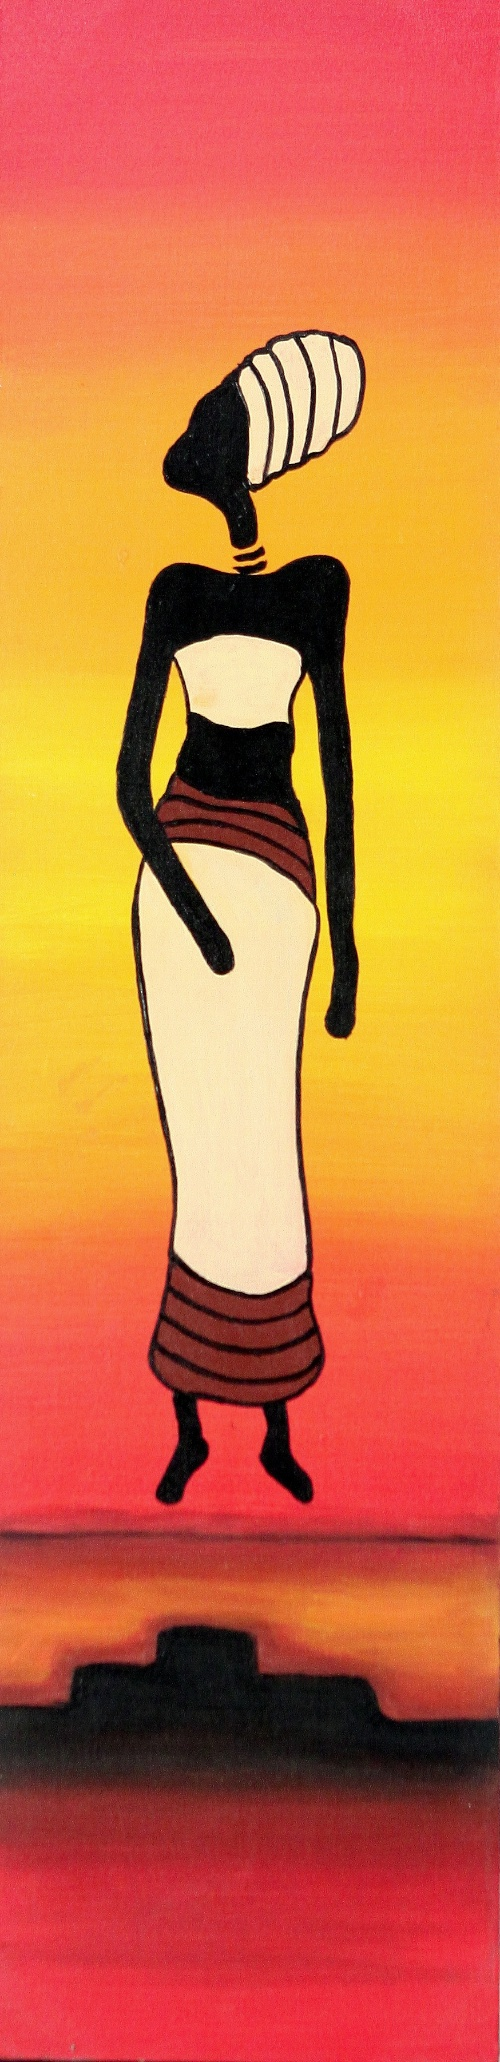 Lady with Headdress (Red) by Wardika Original Art